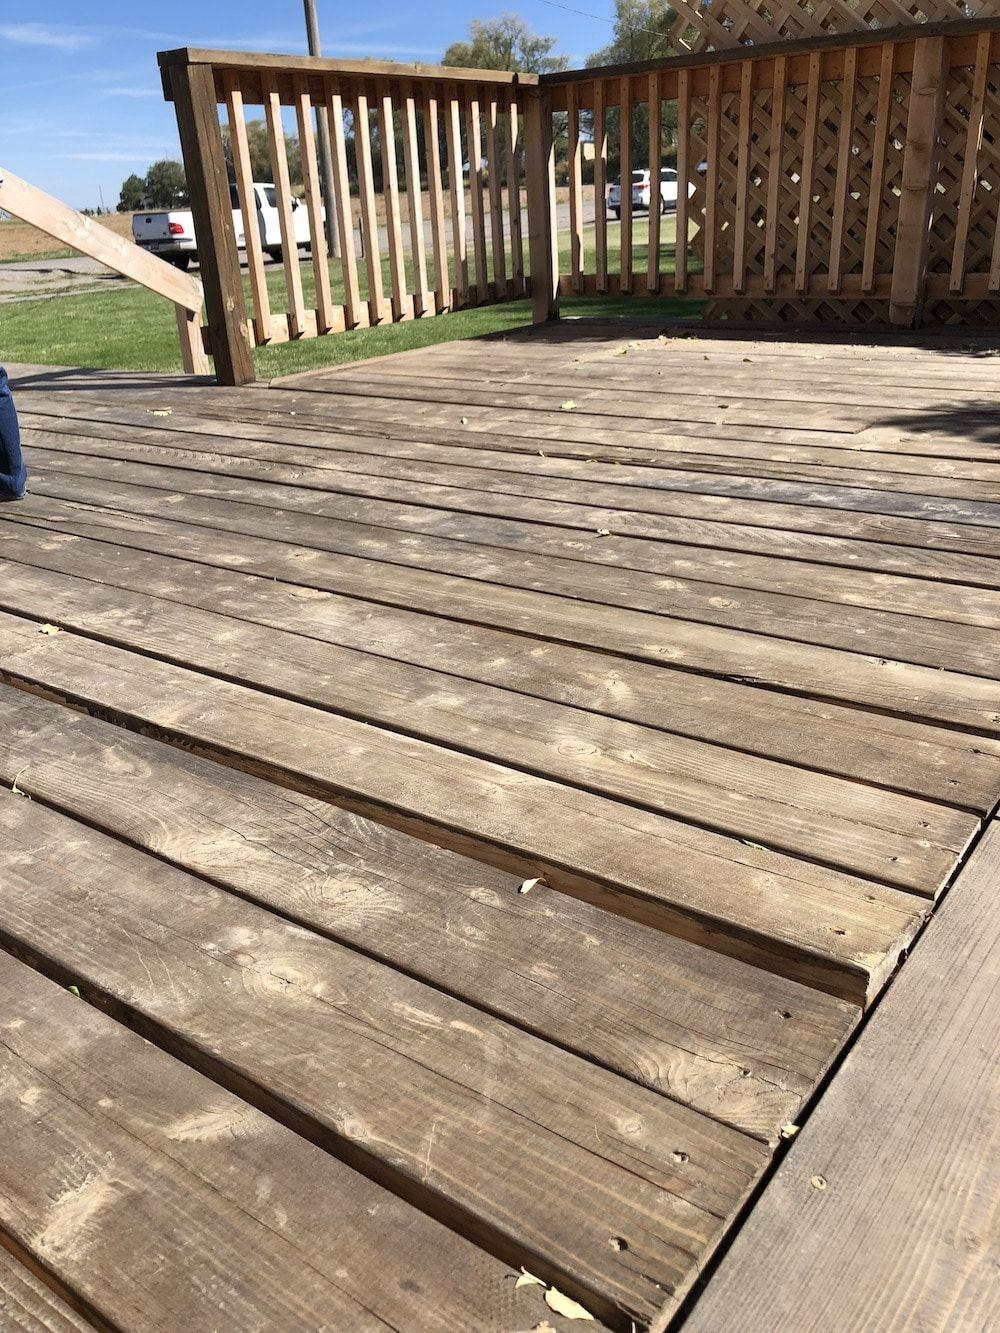 deck wood repair restain prep wooden decks diy chrislovesjulia stain boards warped staining flooring business snow floor pergola remove outdoor